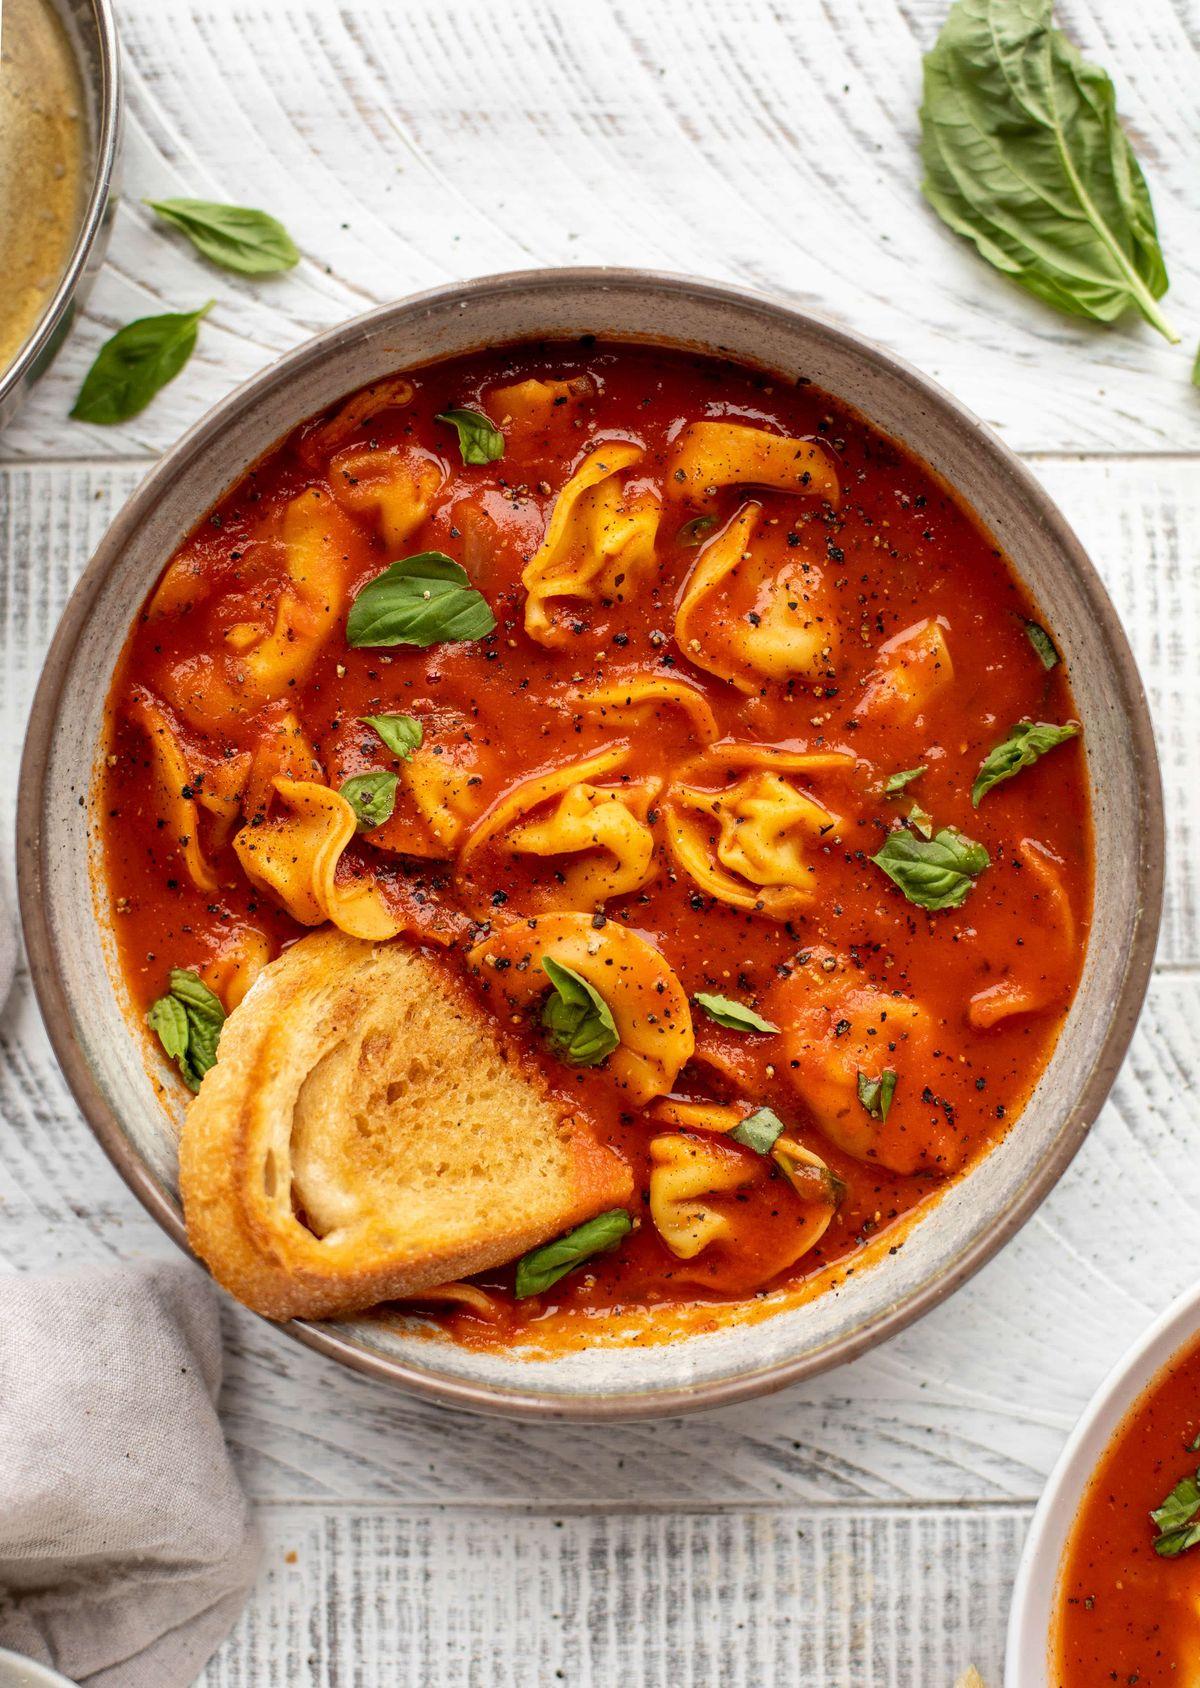 Tomato Tortellini Soup - Curried Tomato Tortellini Soup with Garlic Toast